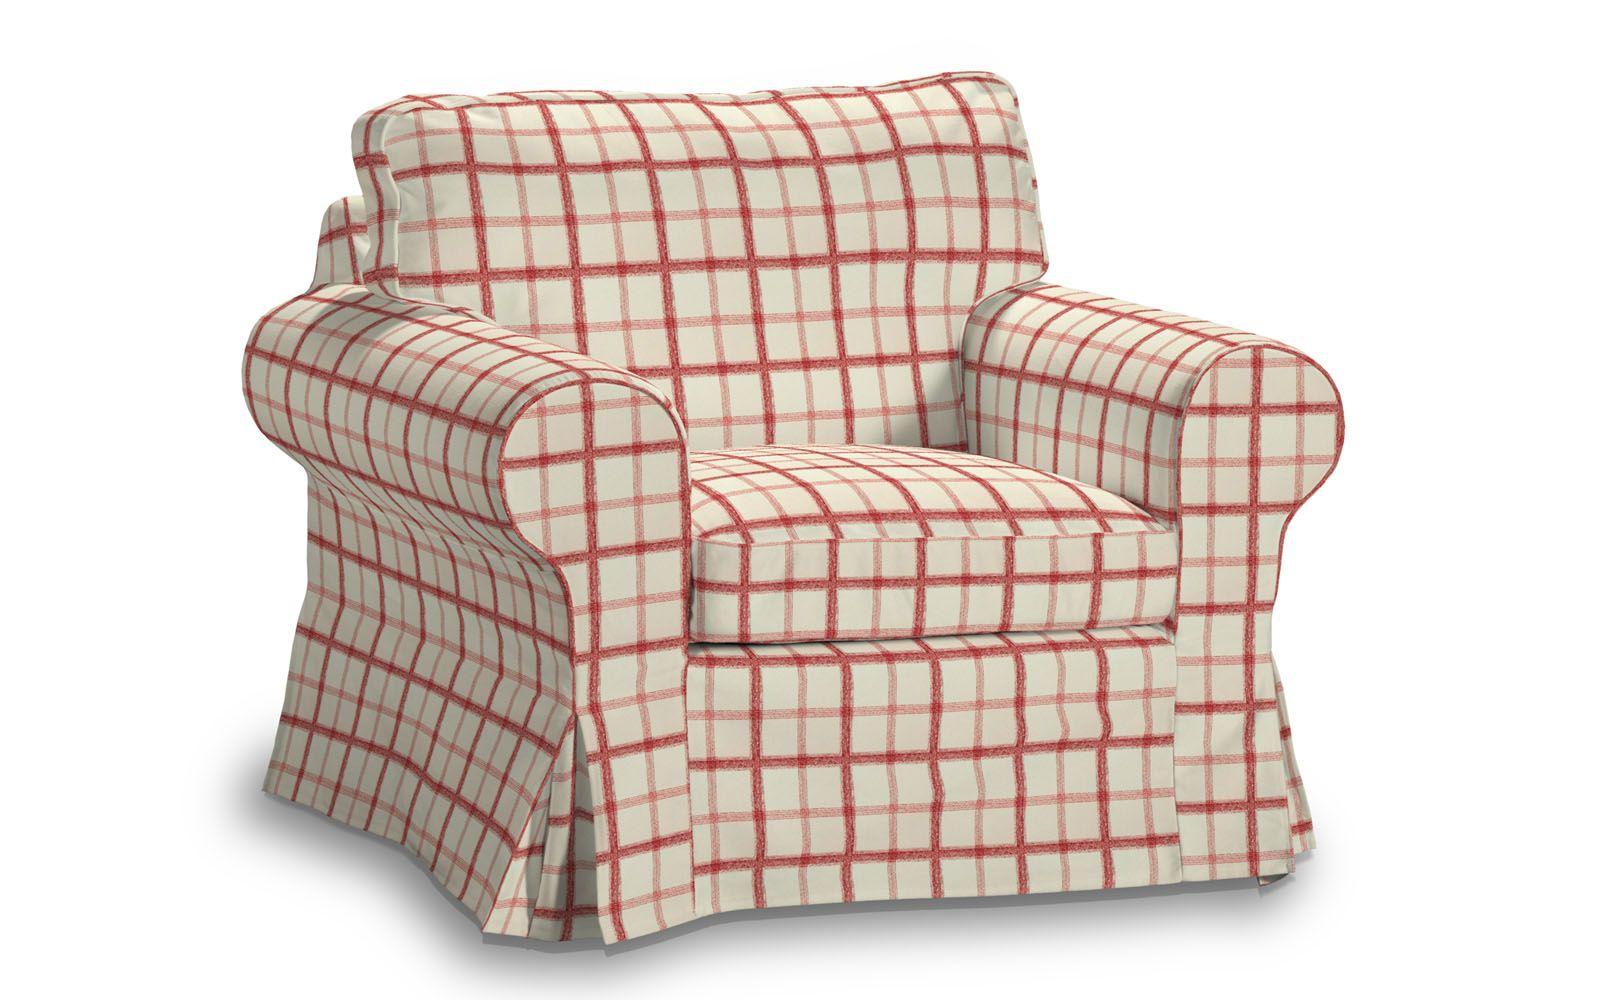 Bezug In PARIS Rot Kariert Für Den IKEA EKTORP Sessel:  Www.saustarkdesign.com